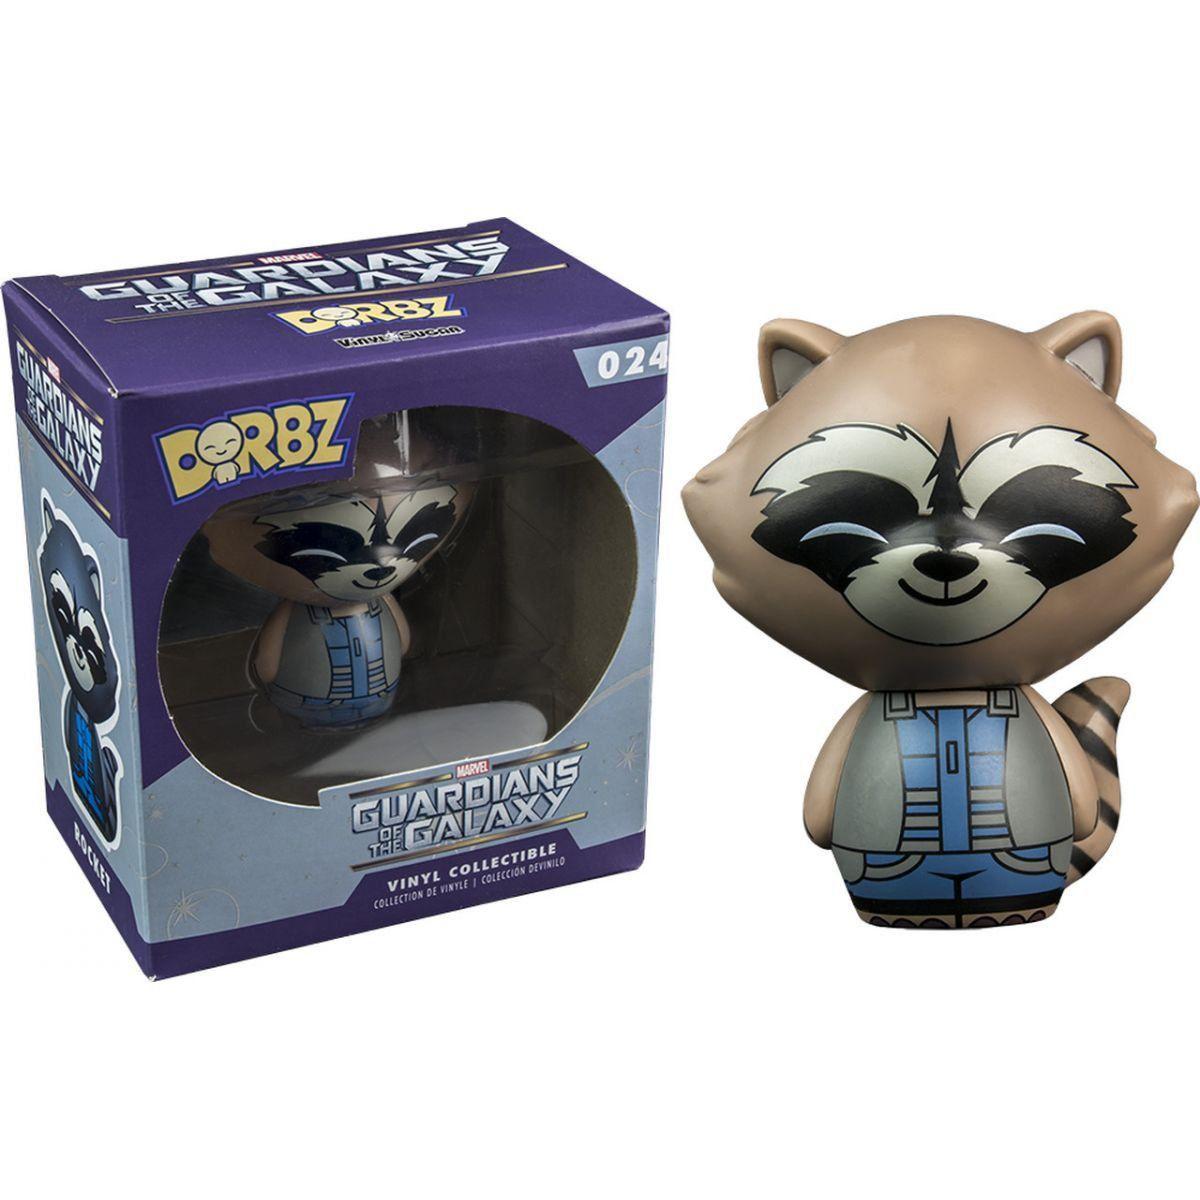 Funko Rocket Raccoon (Nova Corps): Guardiões da Galáxia #024 - Dorbz Funko